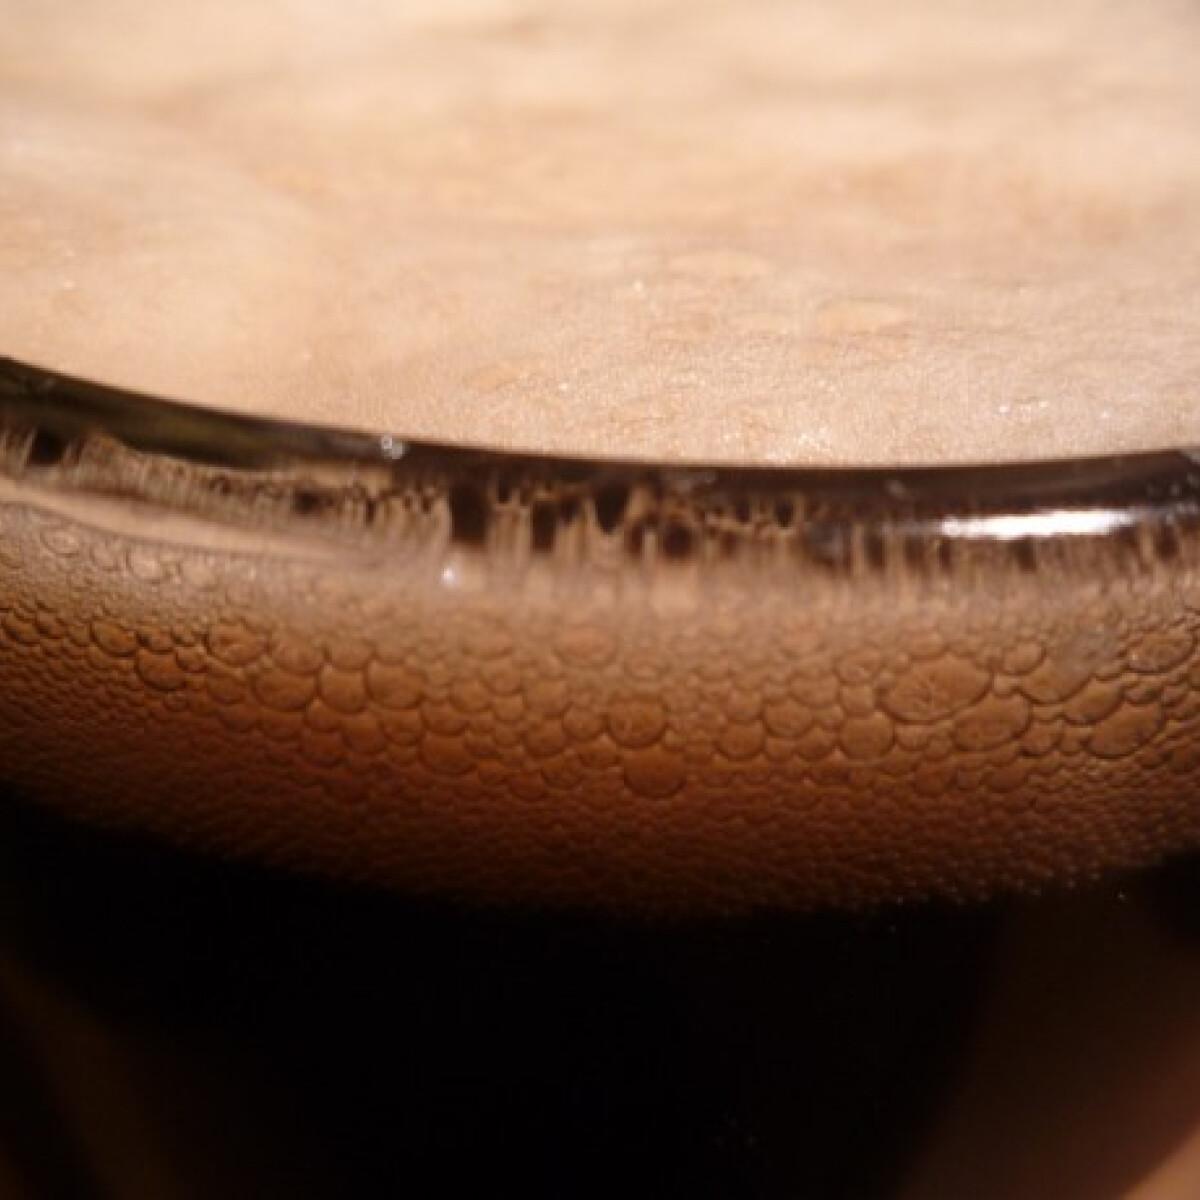 Házi fekete sör